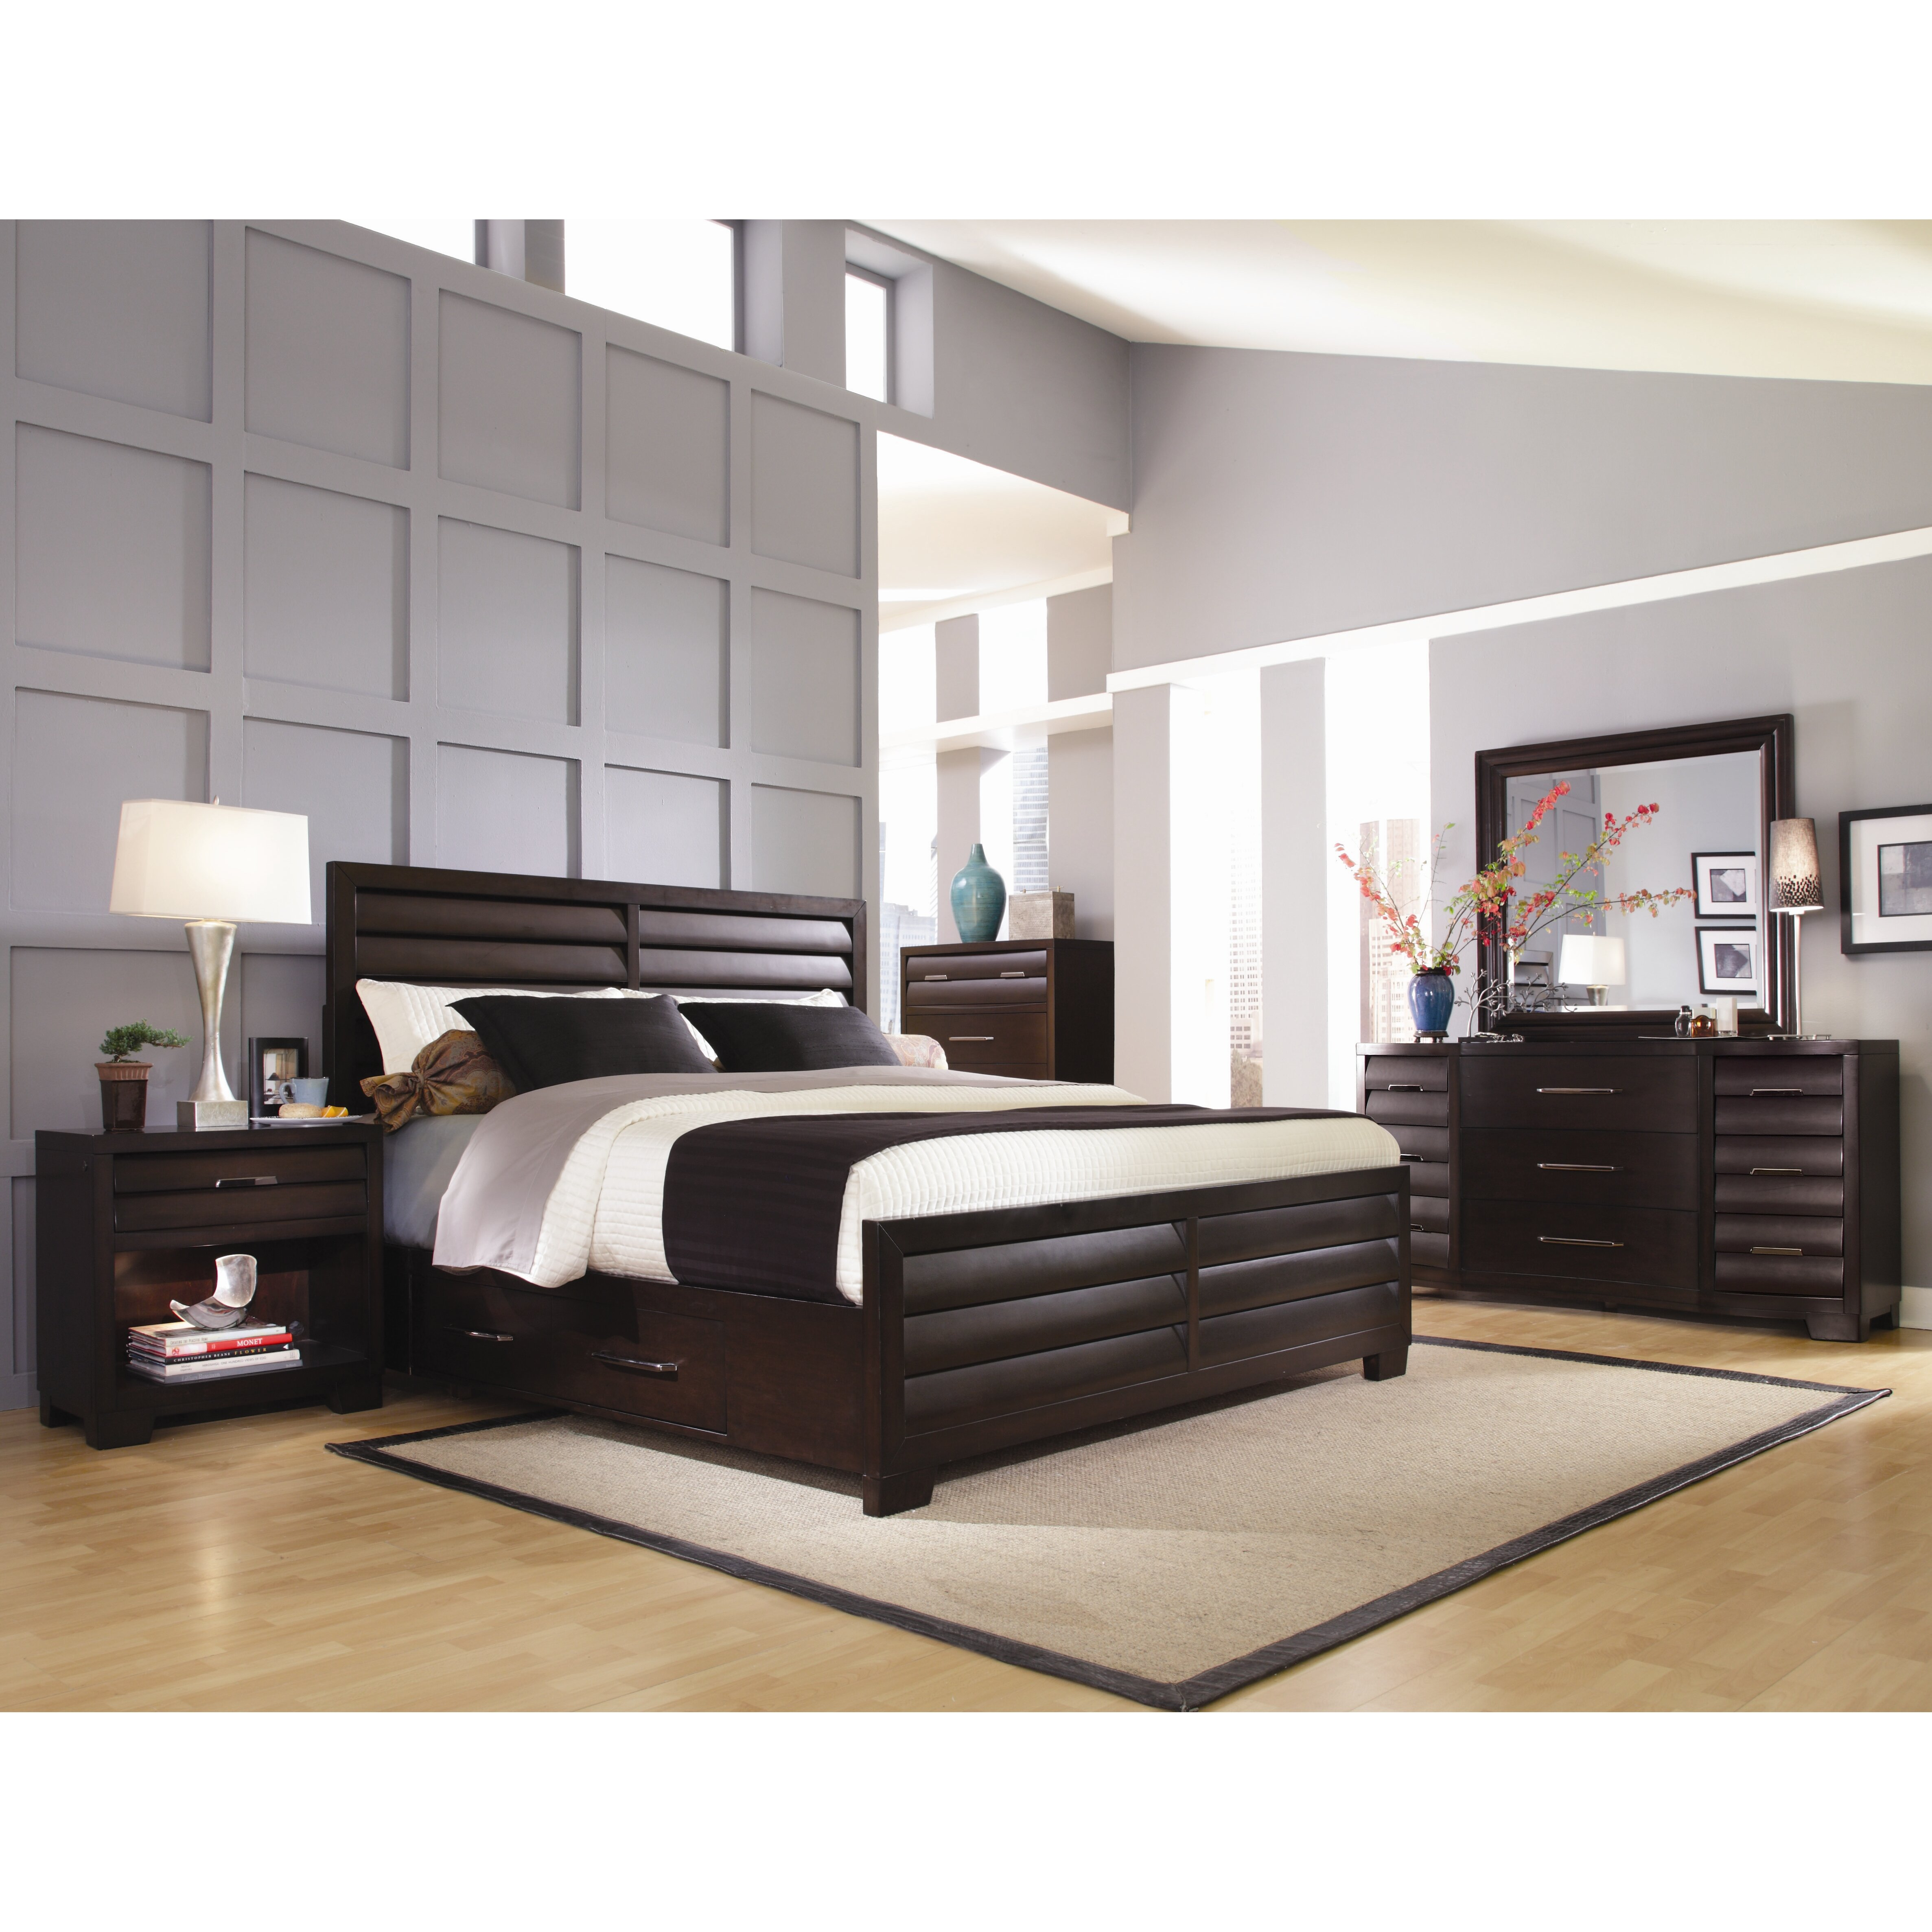 Pulaski sable 1 drawer nightstand reviews wayfair for I furniture reviews